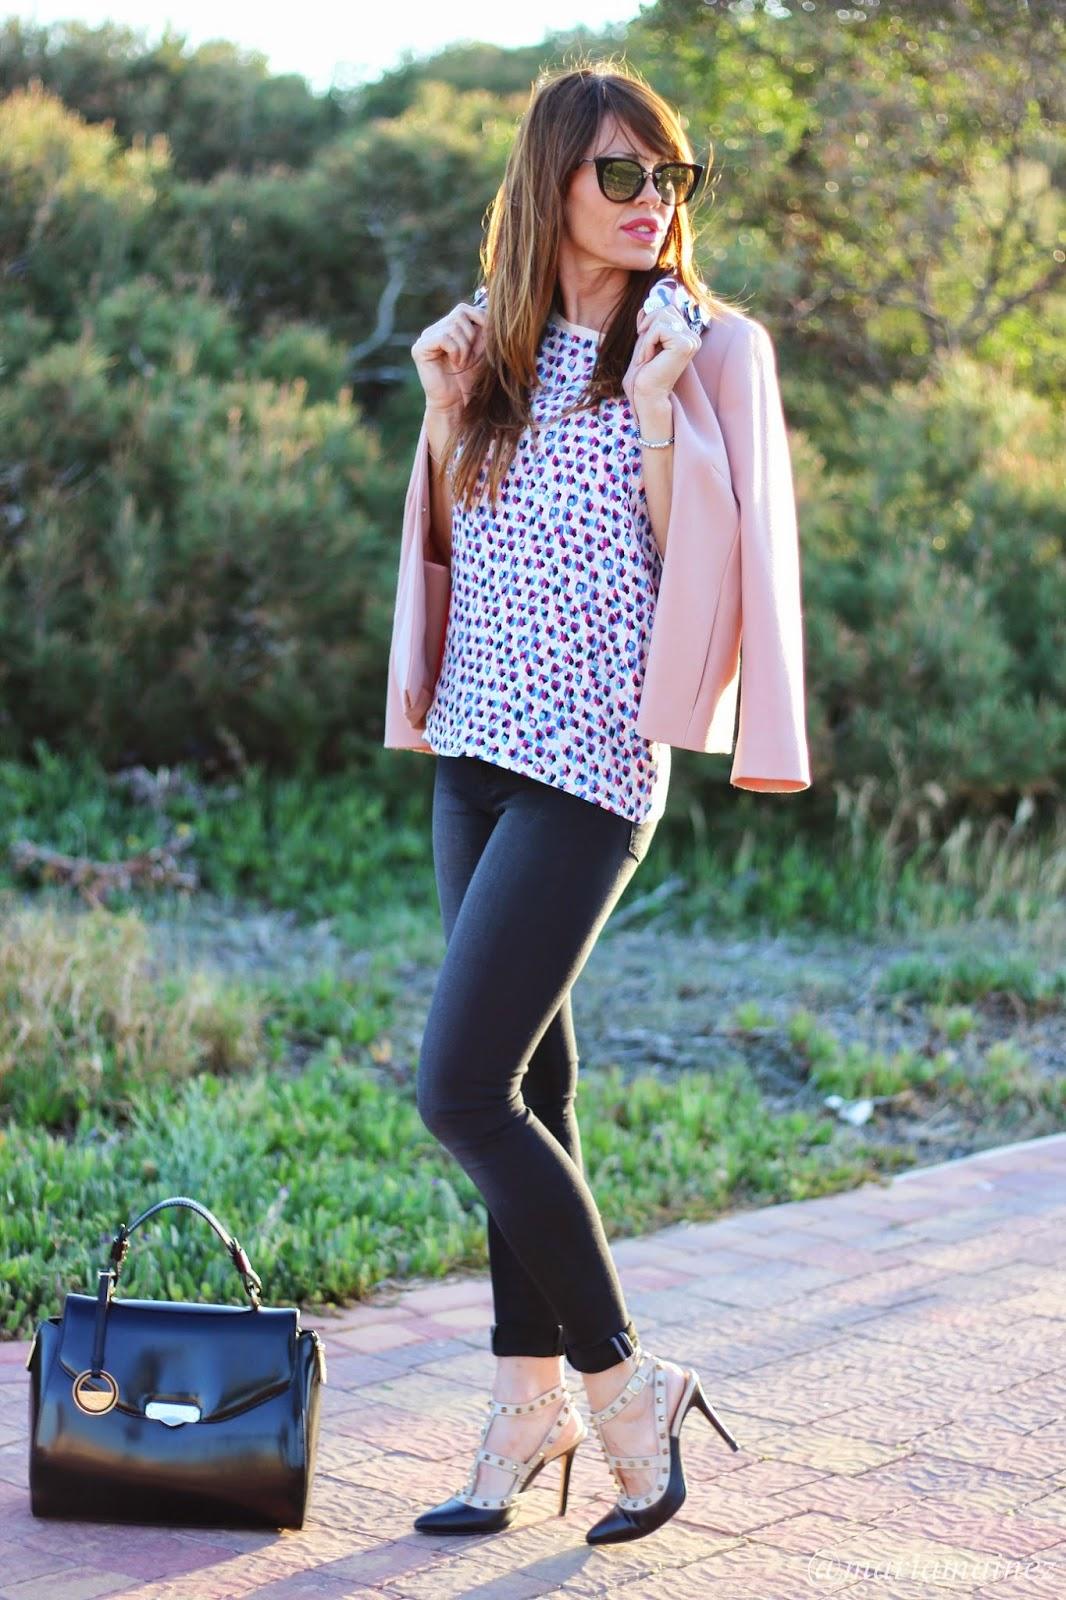 Streetstyle Red Valentino - Marella - Versace Collection - Fashion blogger